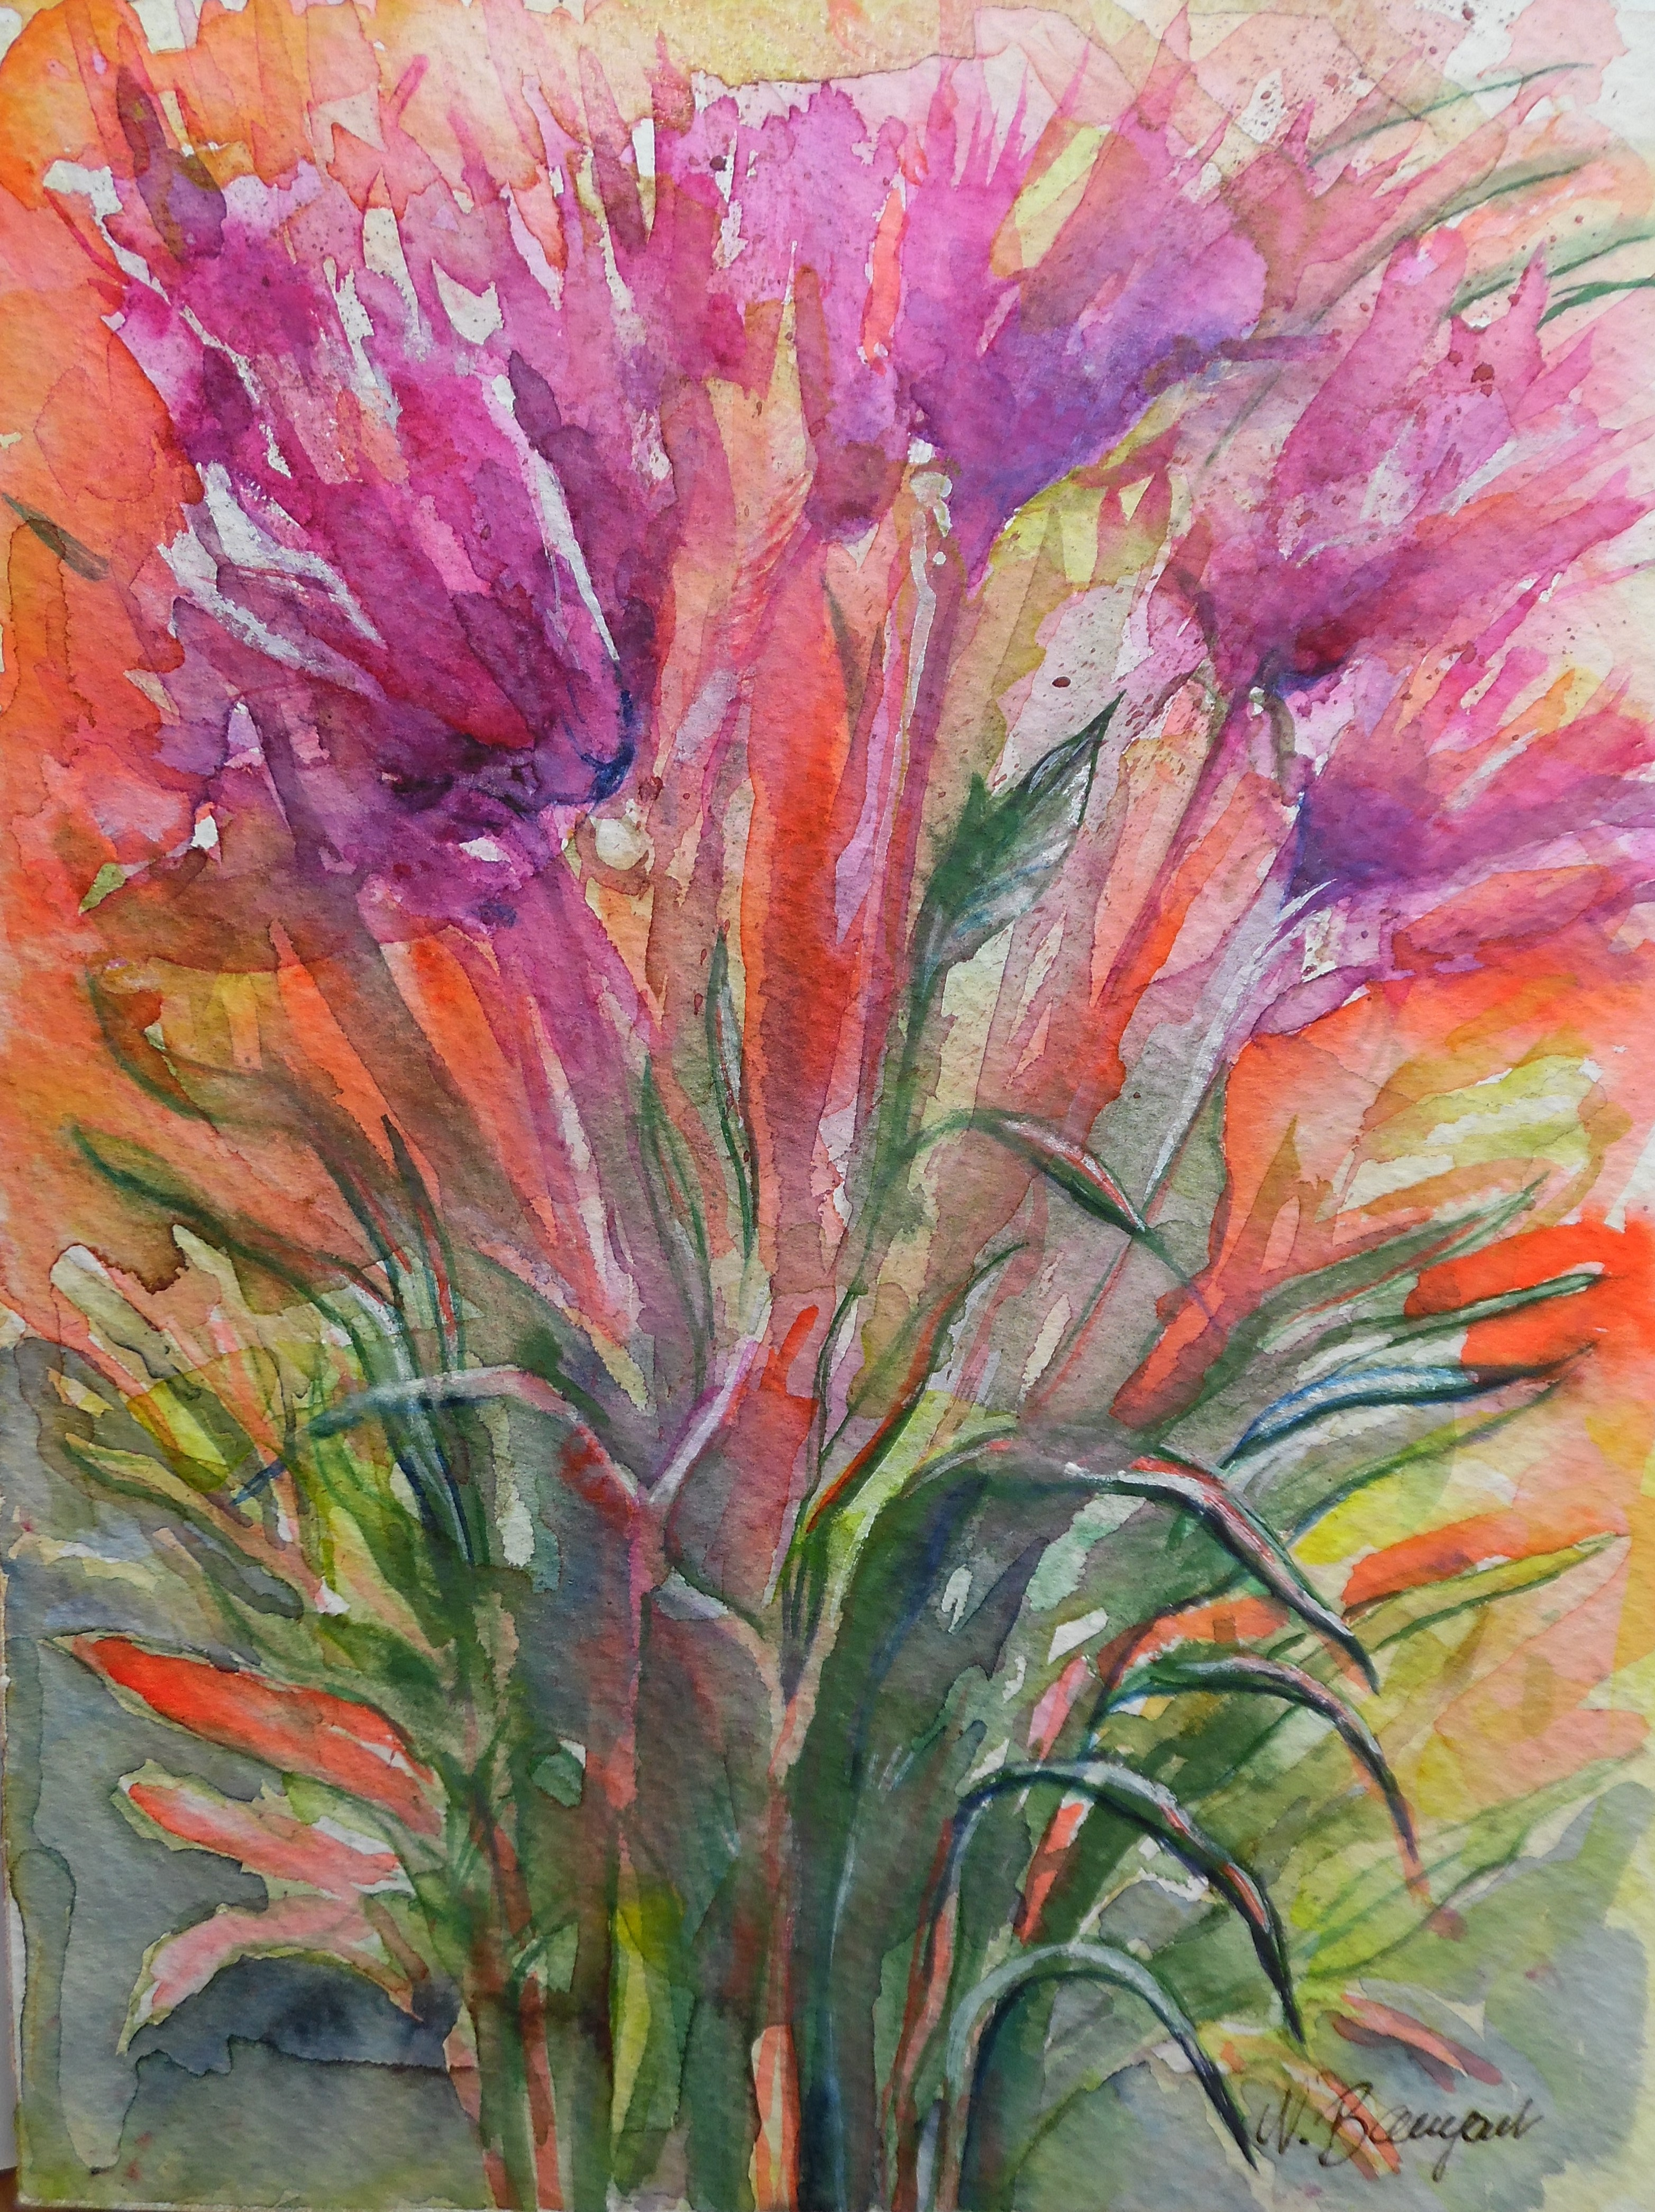 Flowers-Blumen-Jazz-Aquarell-Watercolor-Nadia-Baumgart